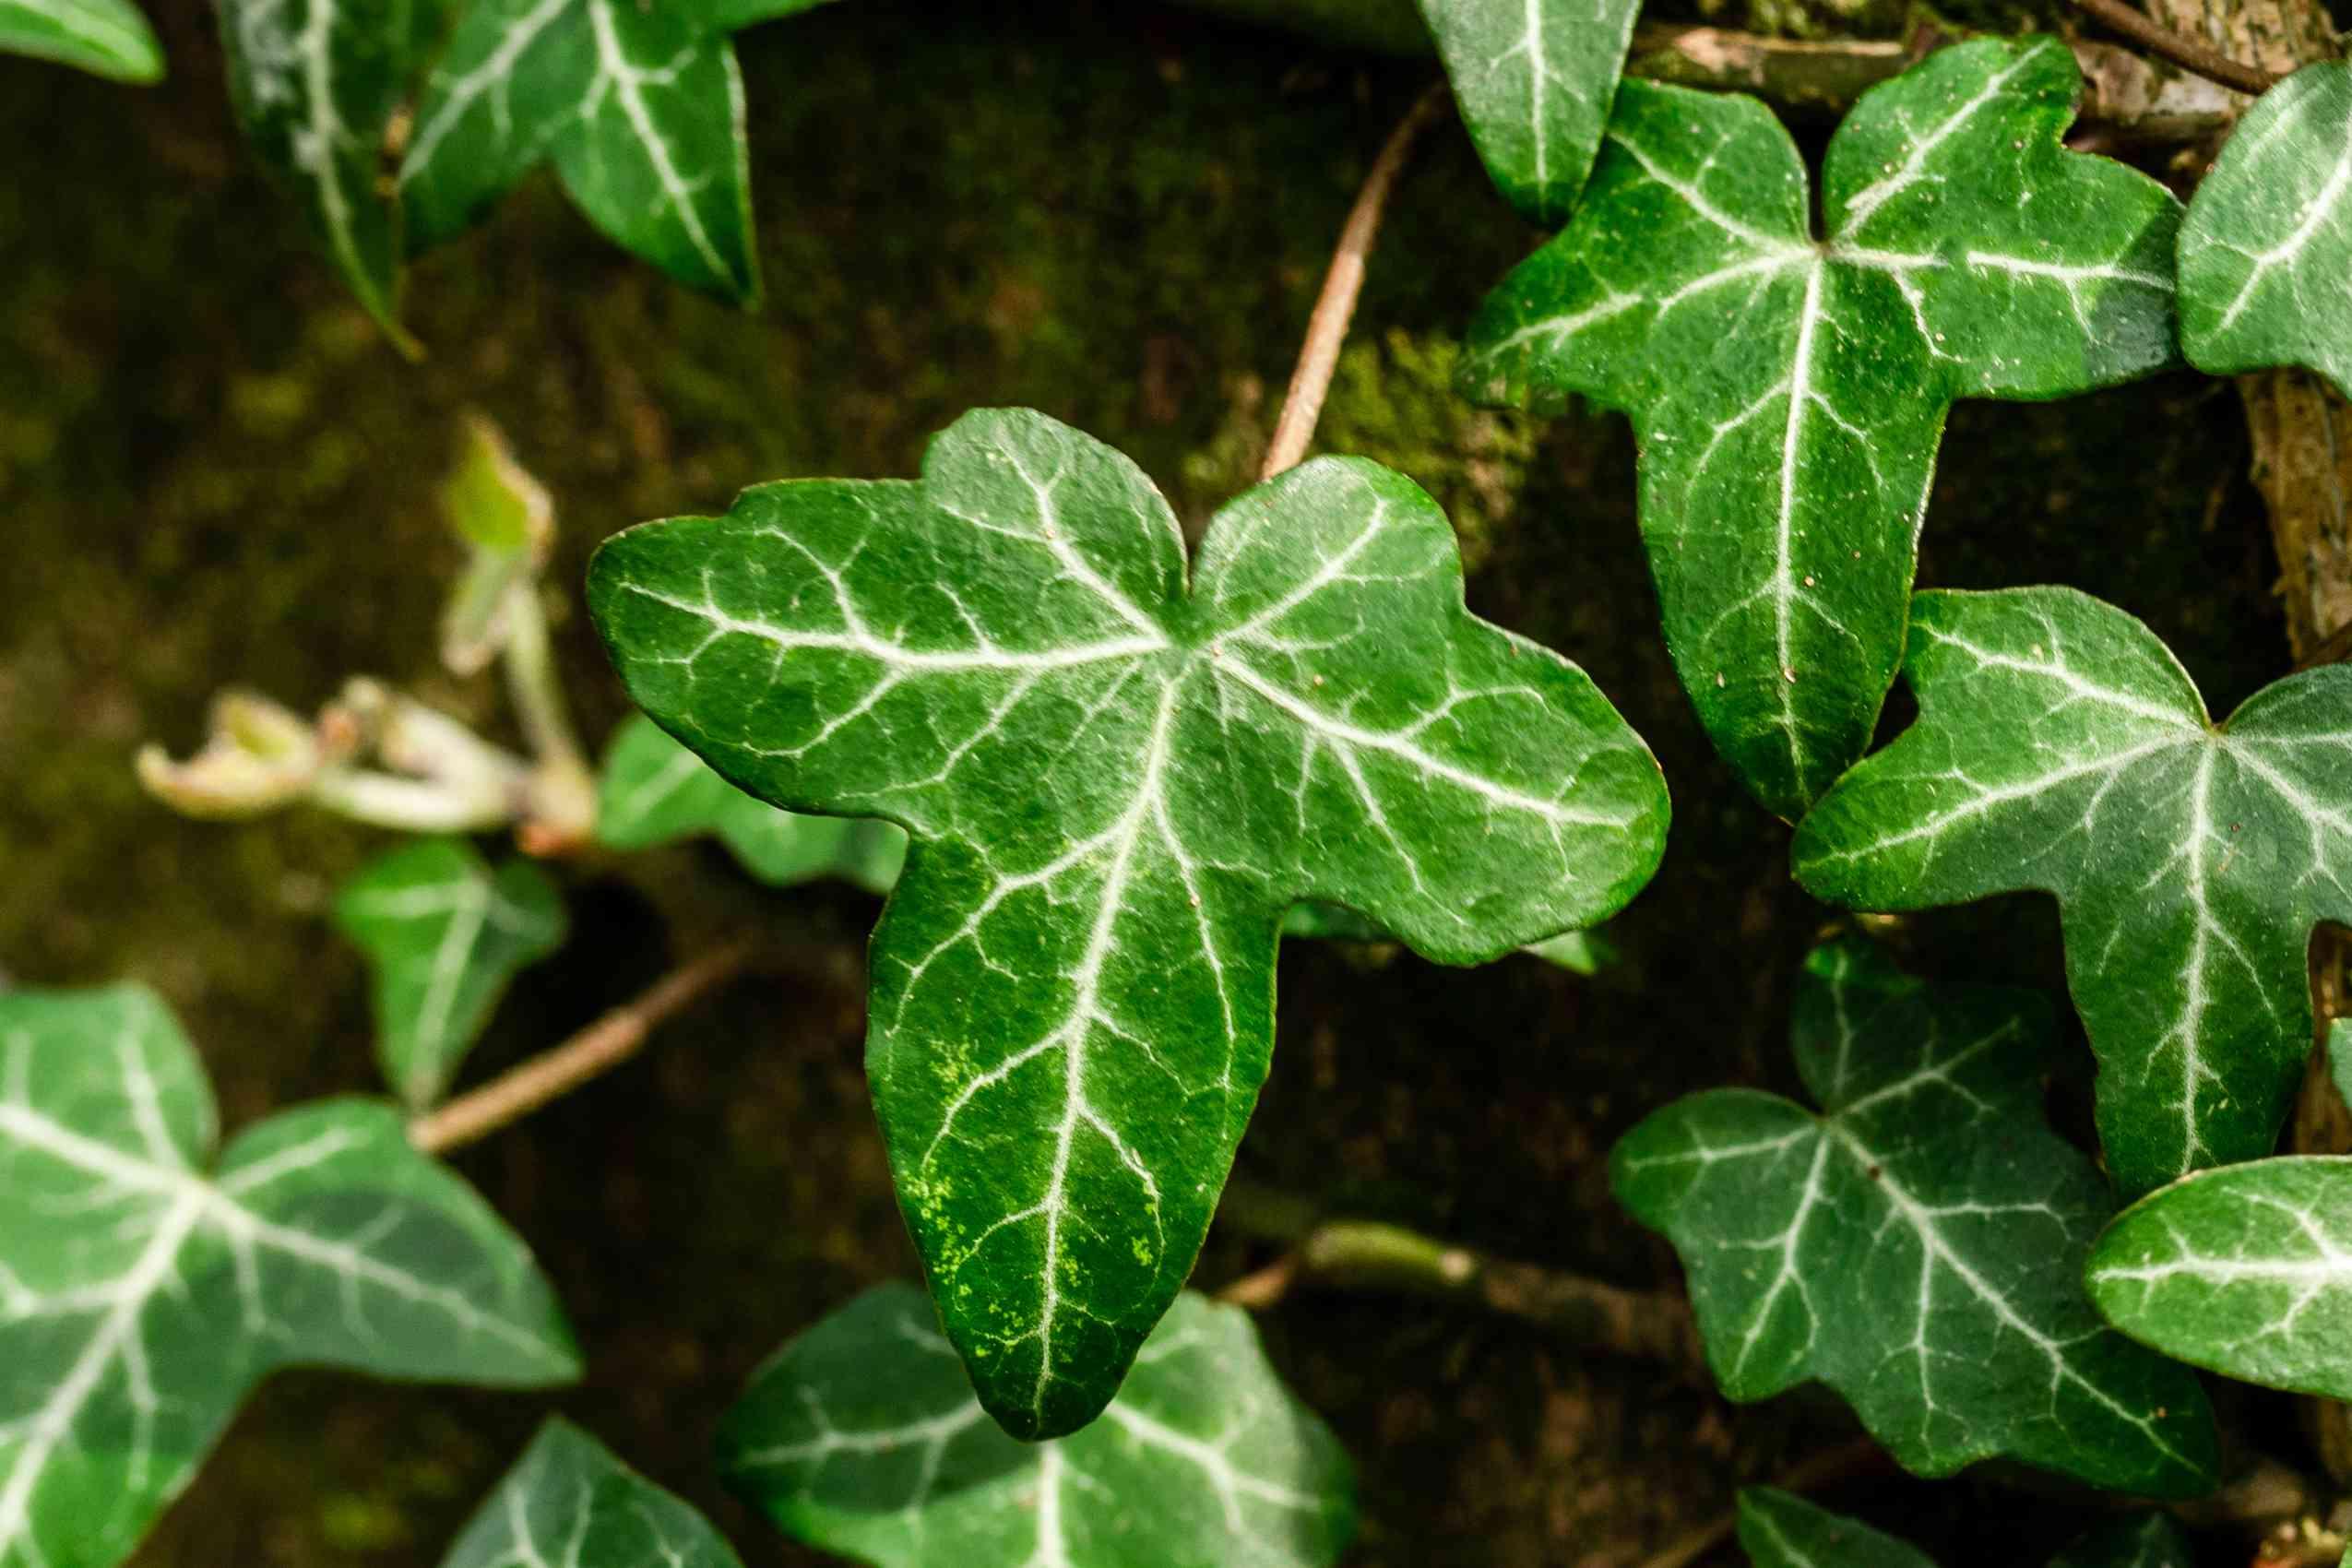 closeup of an english ivy leaf